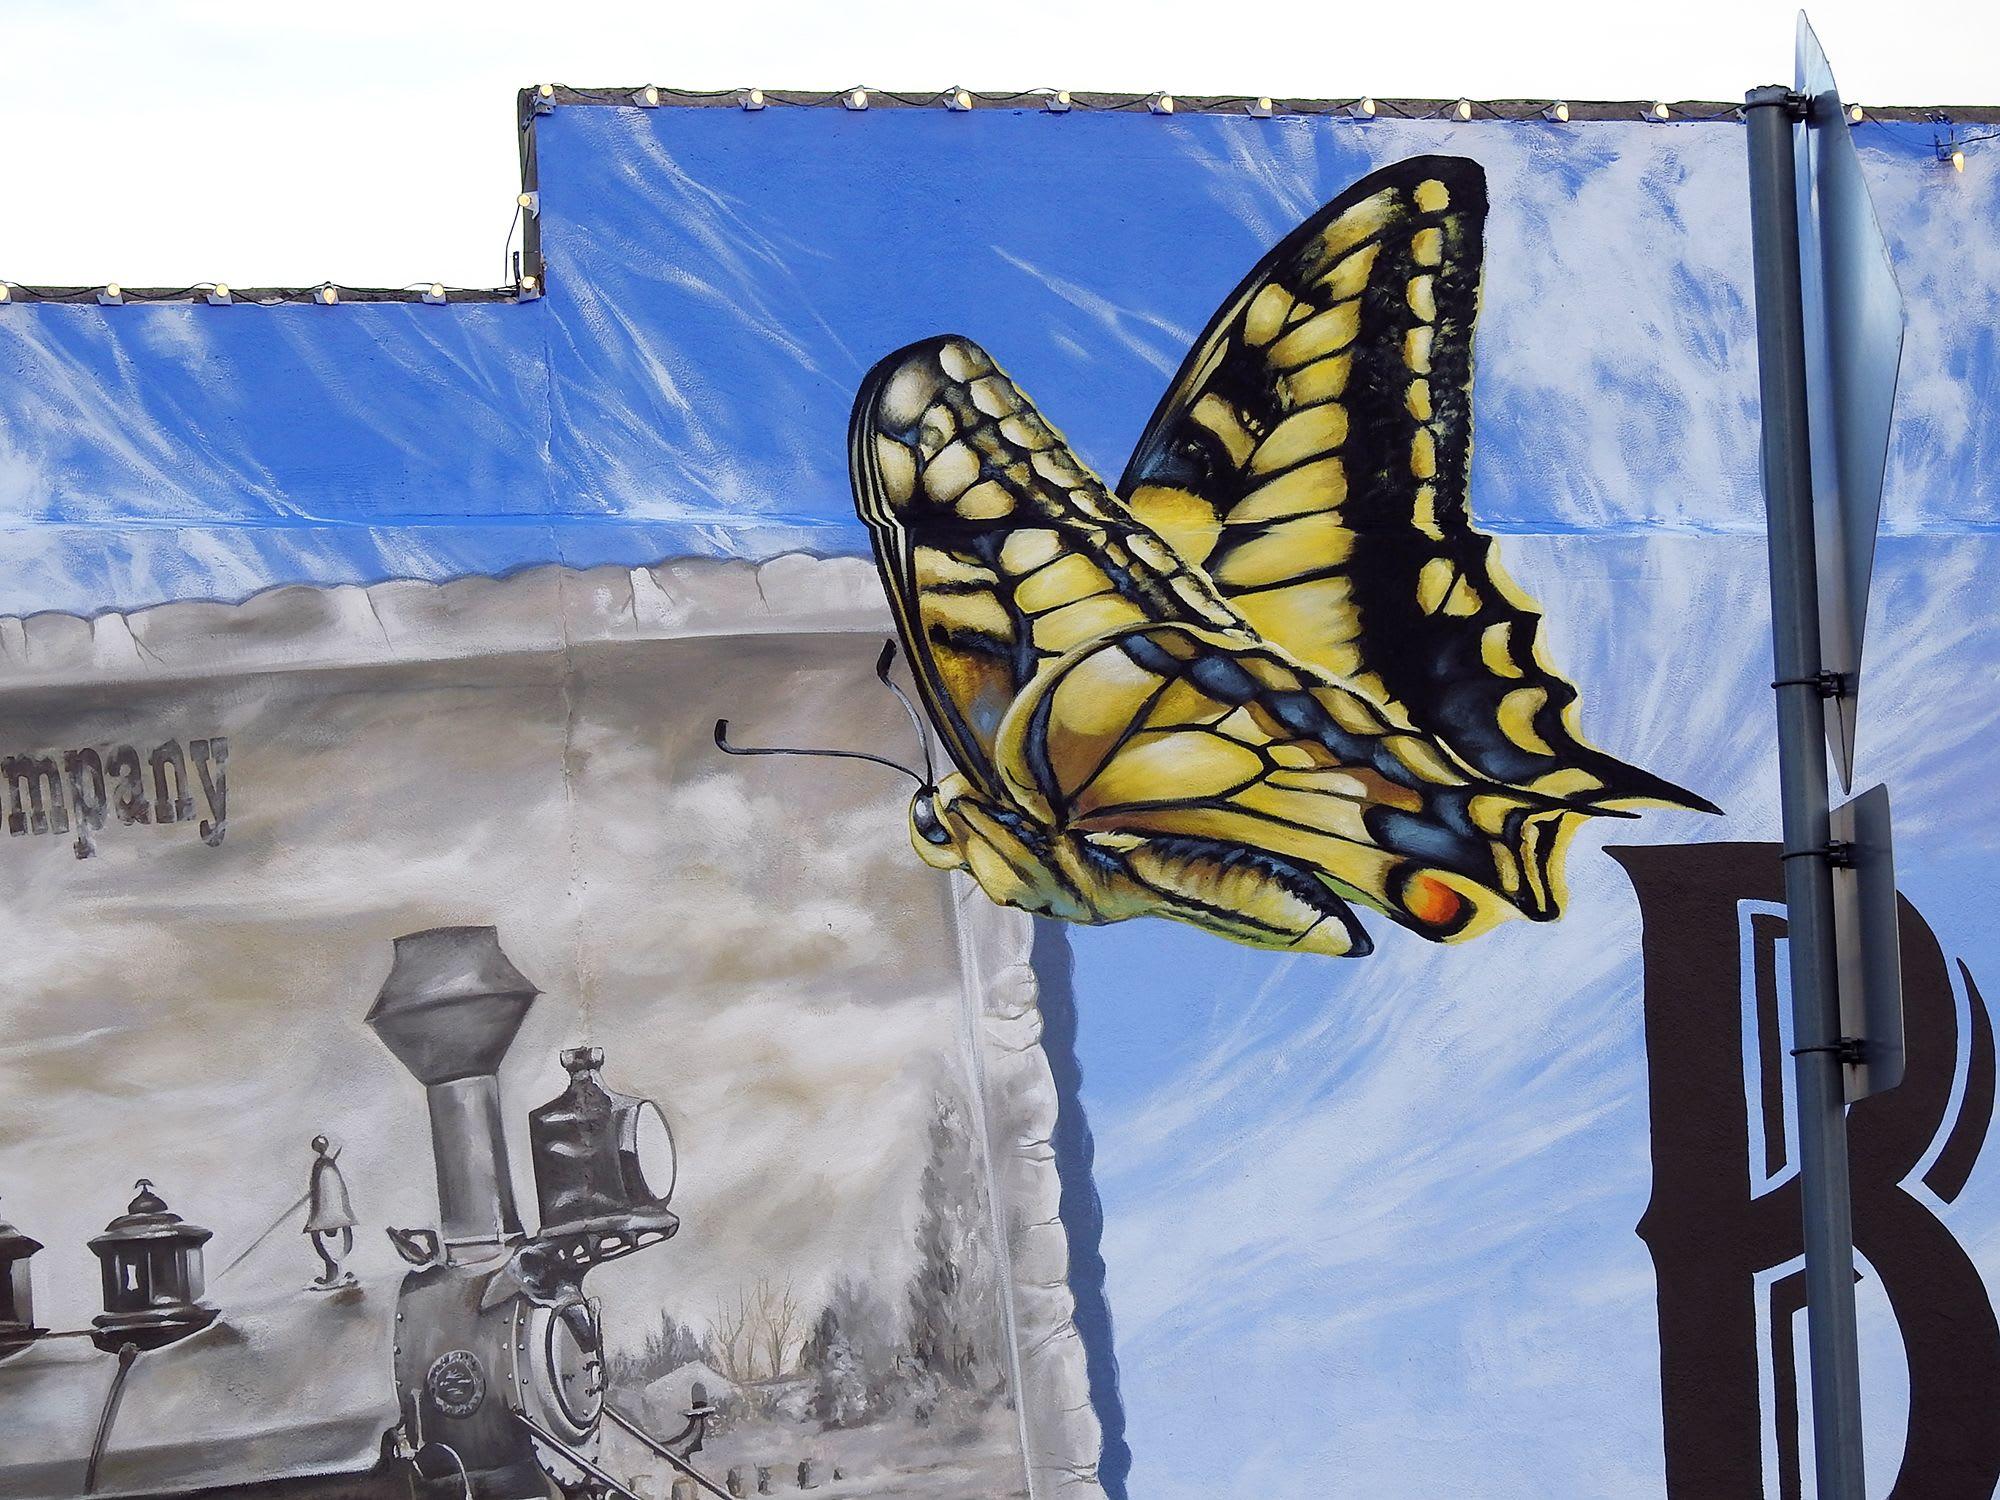 Street Murals by Anat Ronen seen at Brenham, Brenham - The Brenham mural